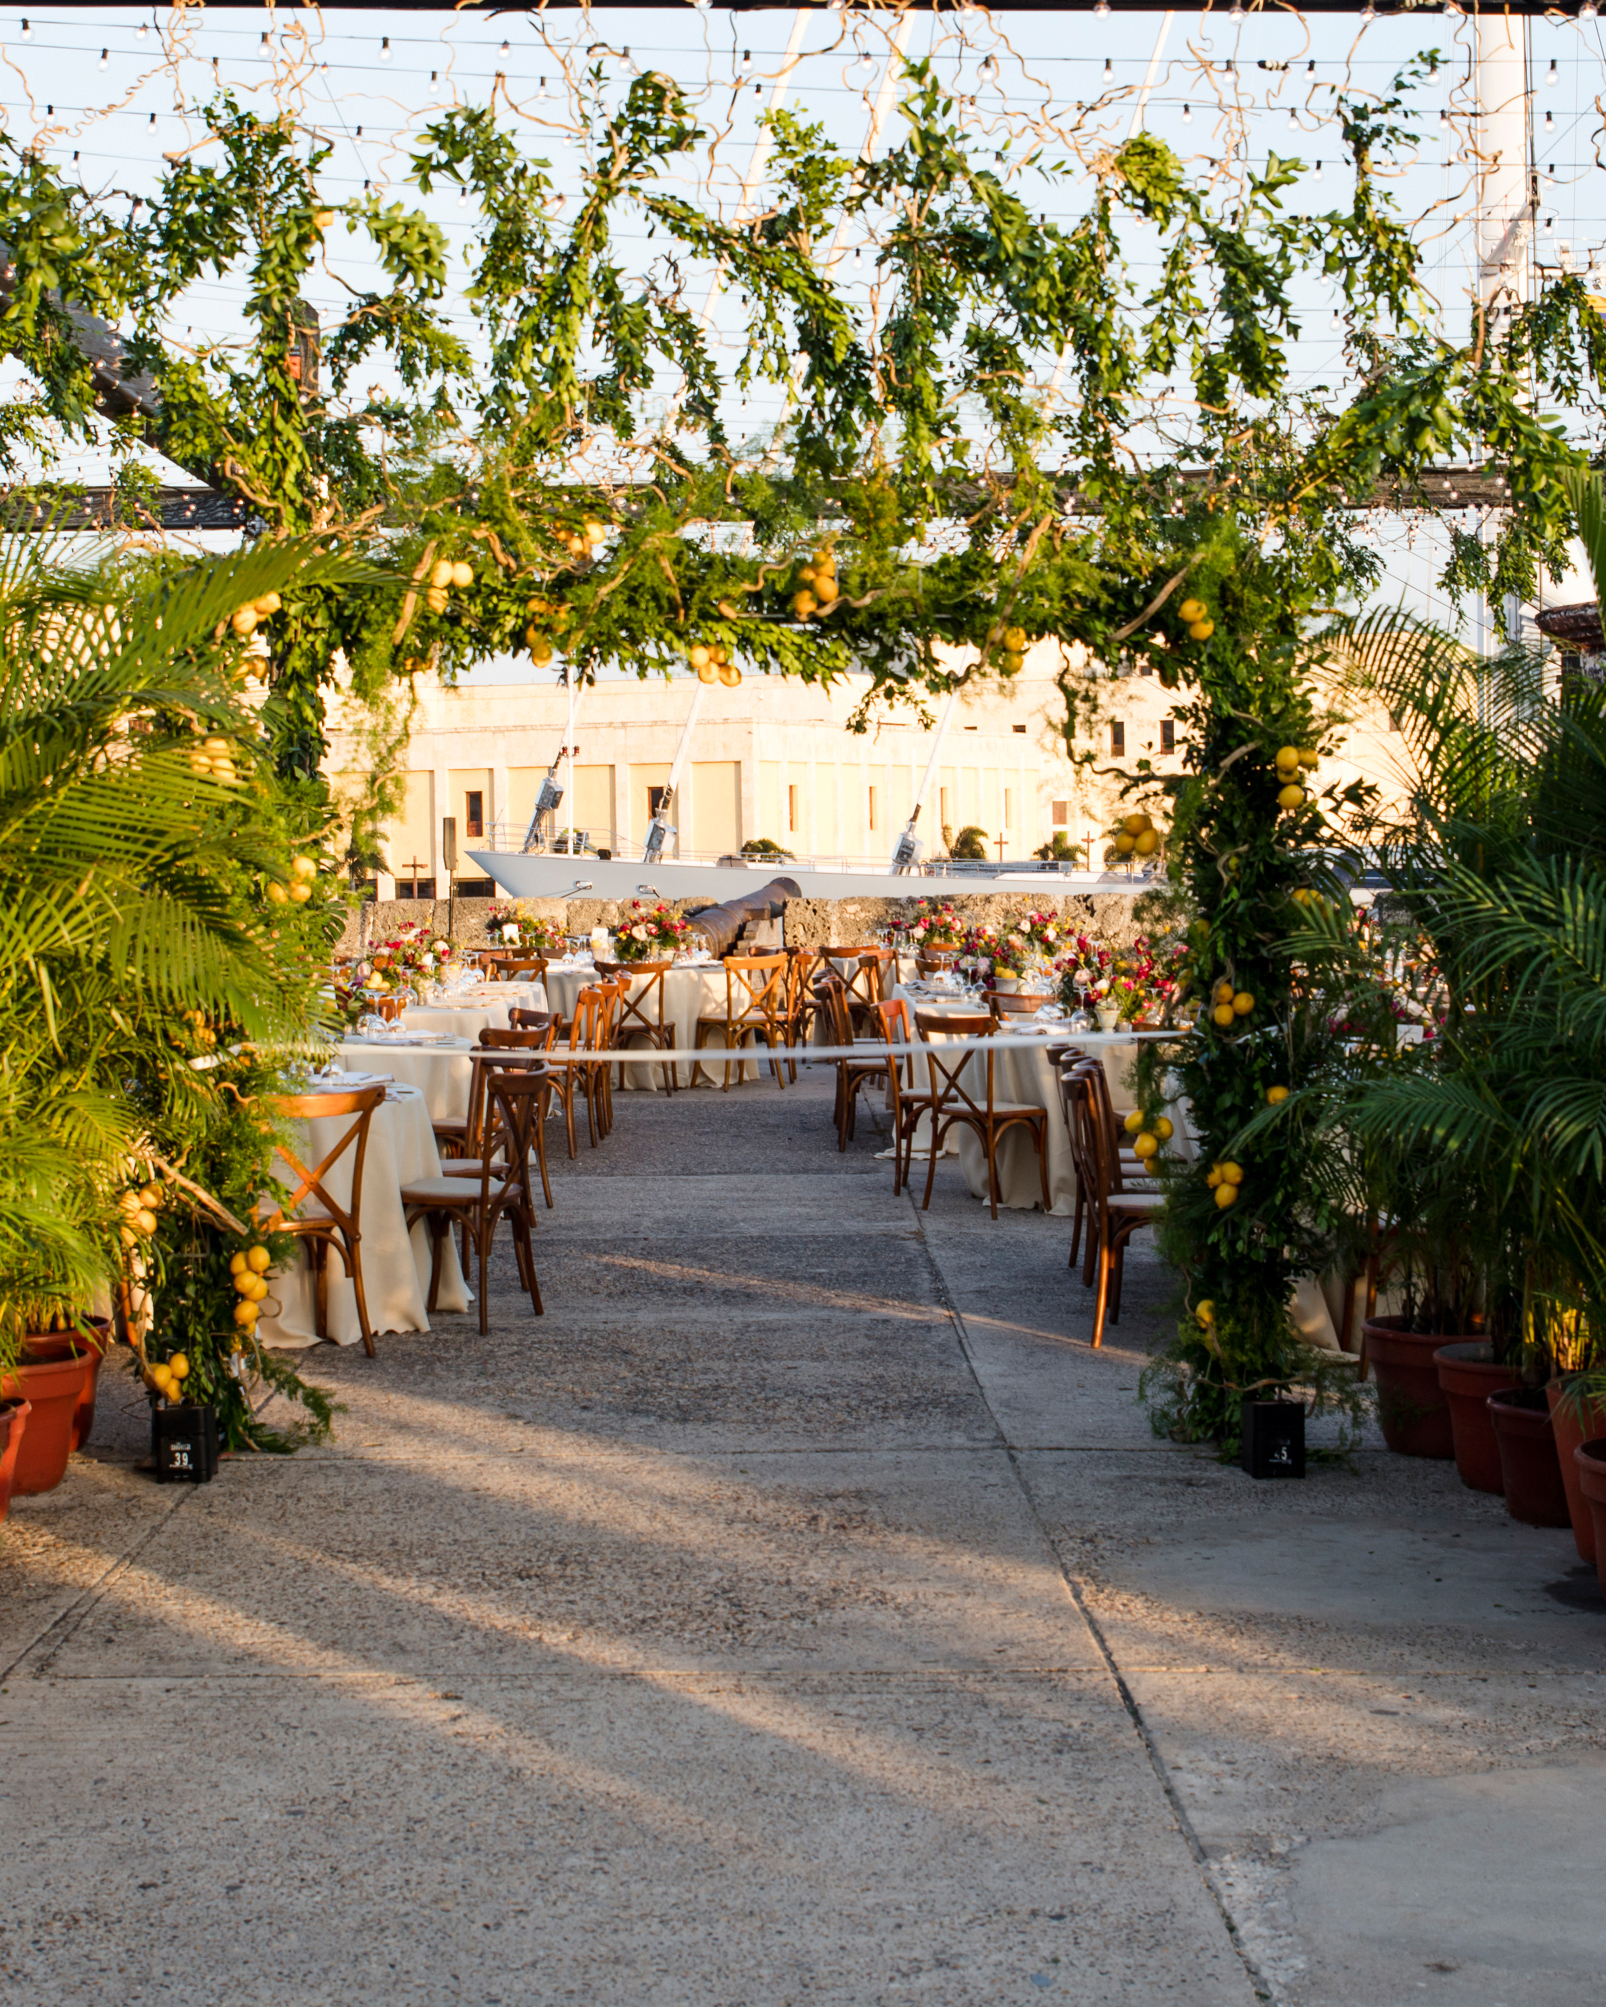 cristina andre wedding greenery